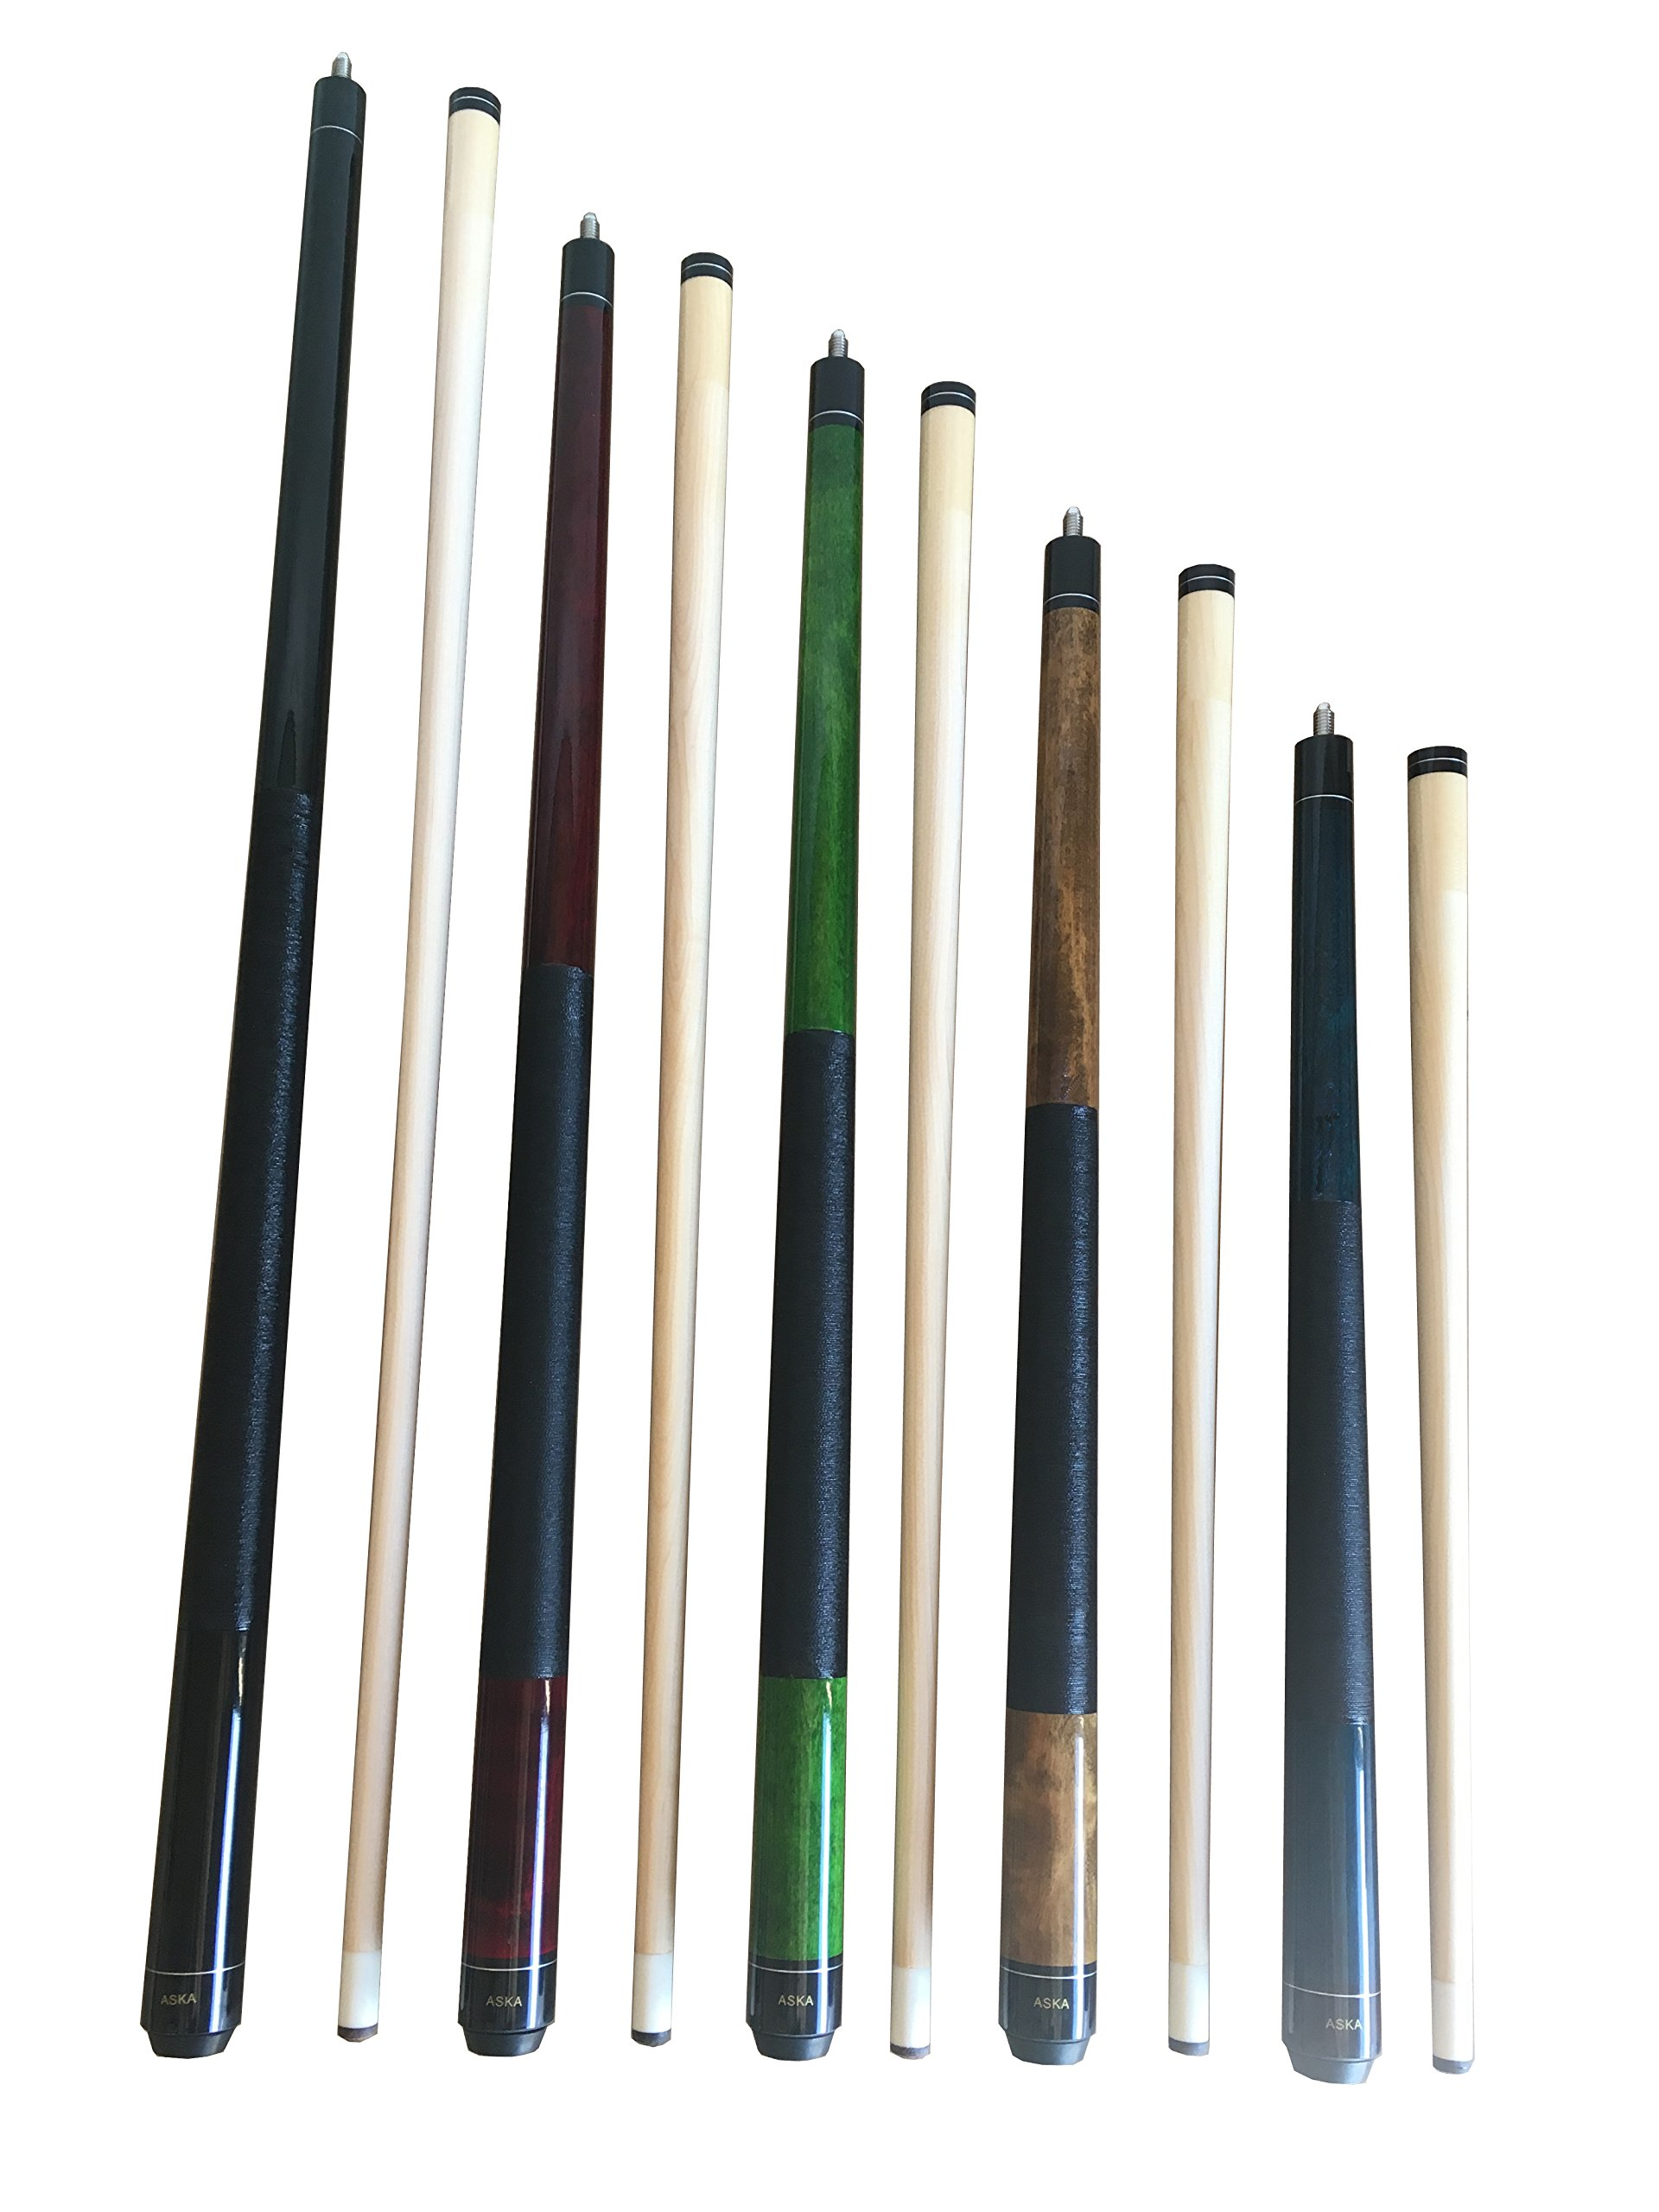 Set of 5 Aska Mixed Length Cues LS5, Canadian Hard Rock Maple Billiard Pool Cue Sticks, Short, Kids Cues